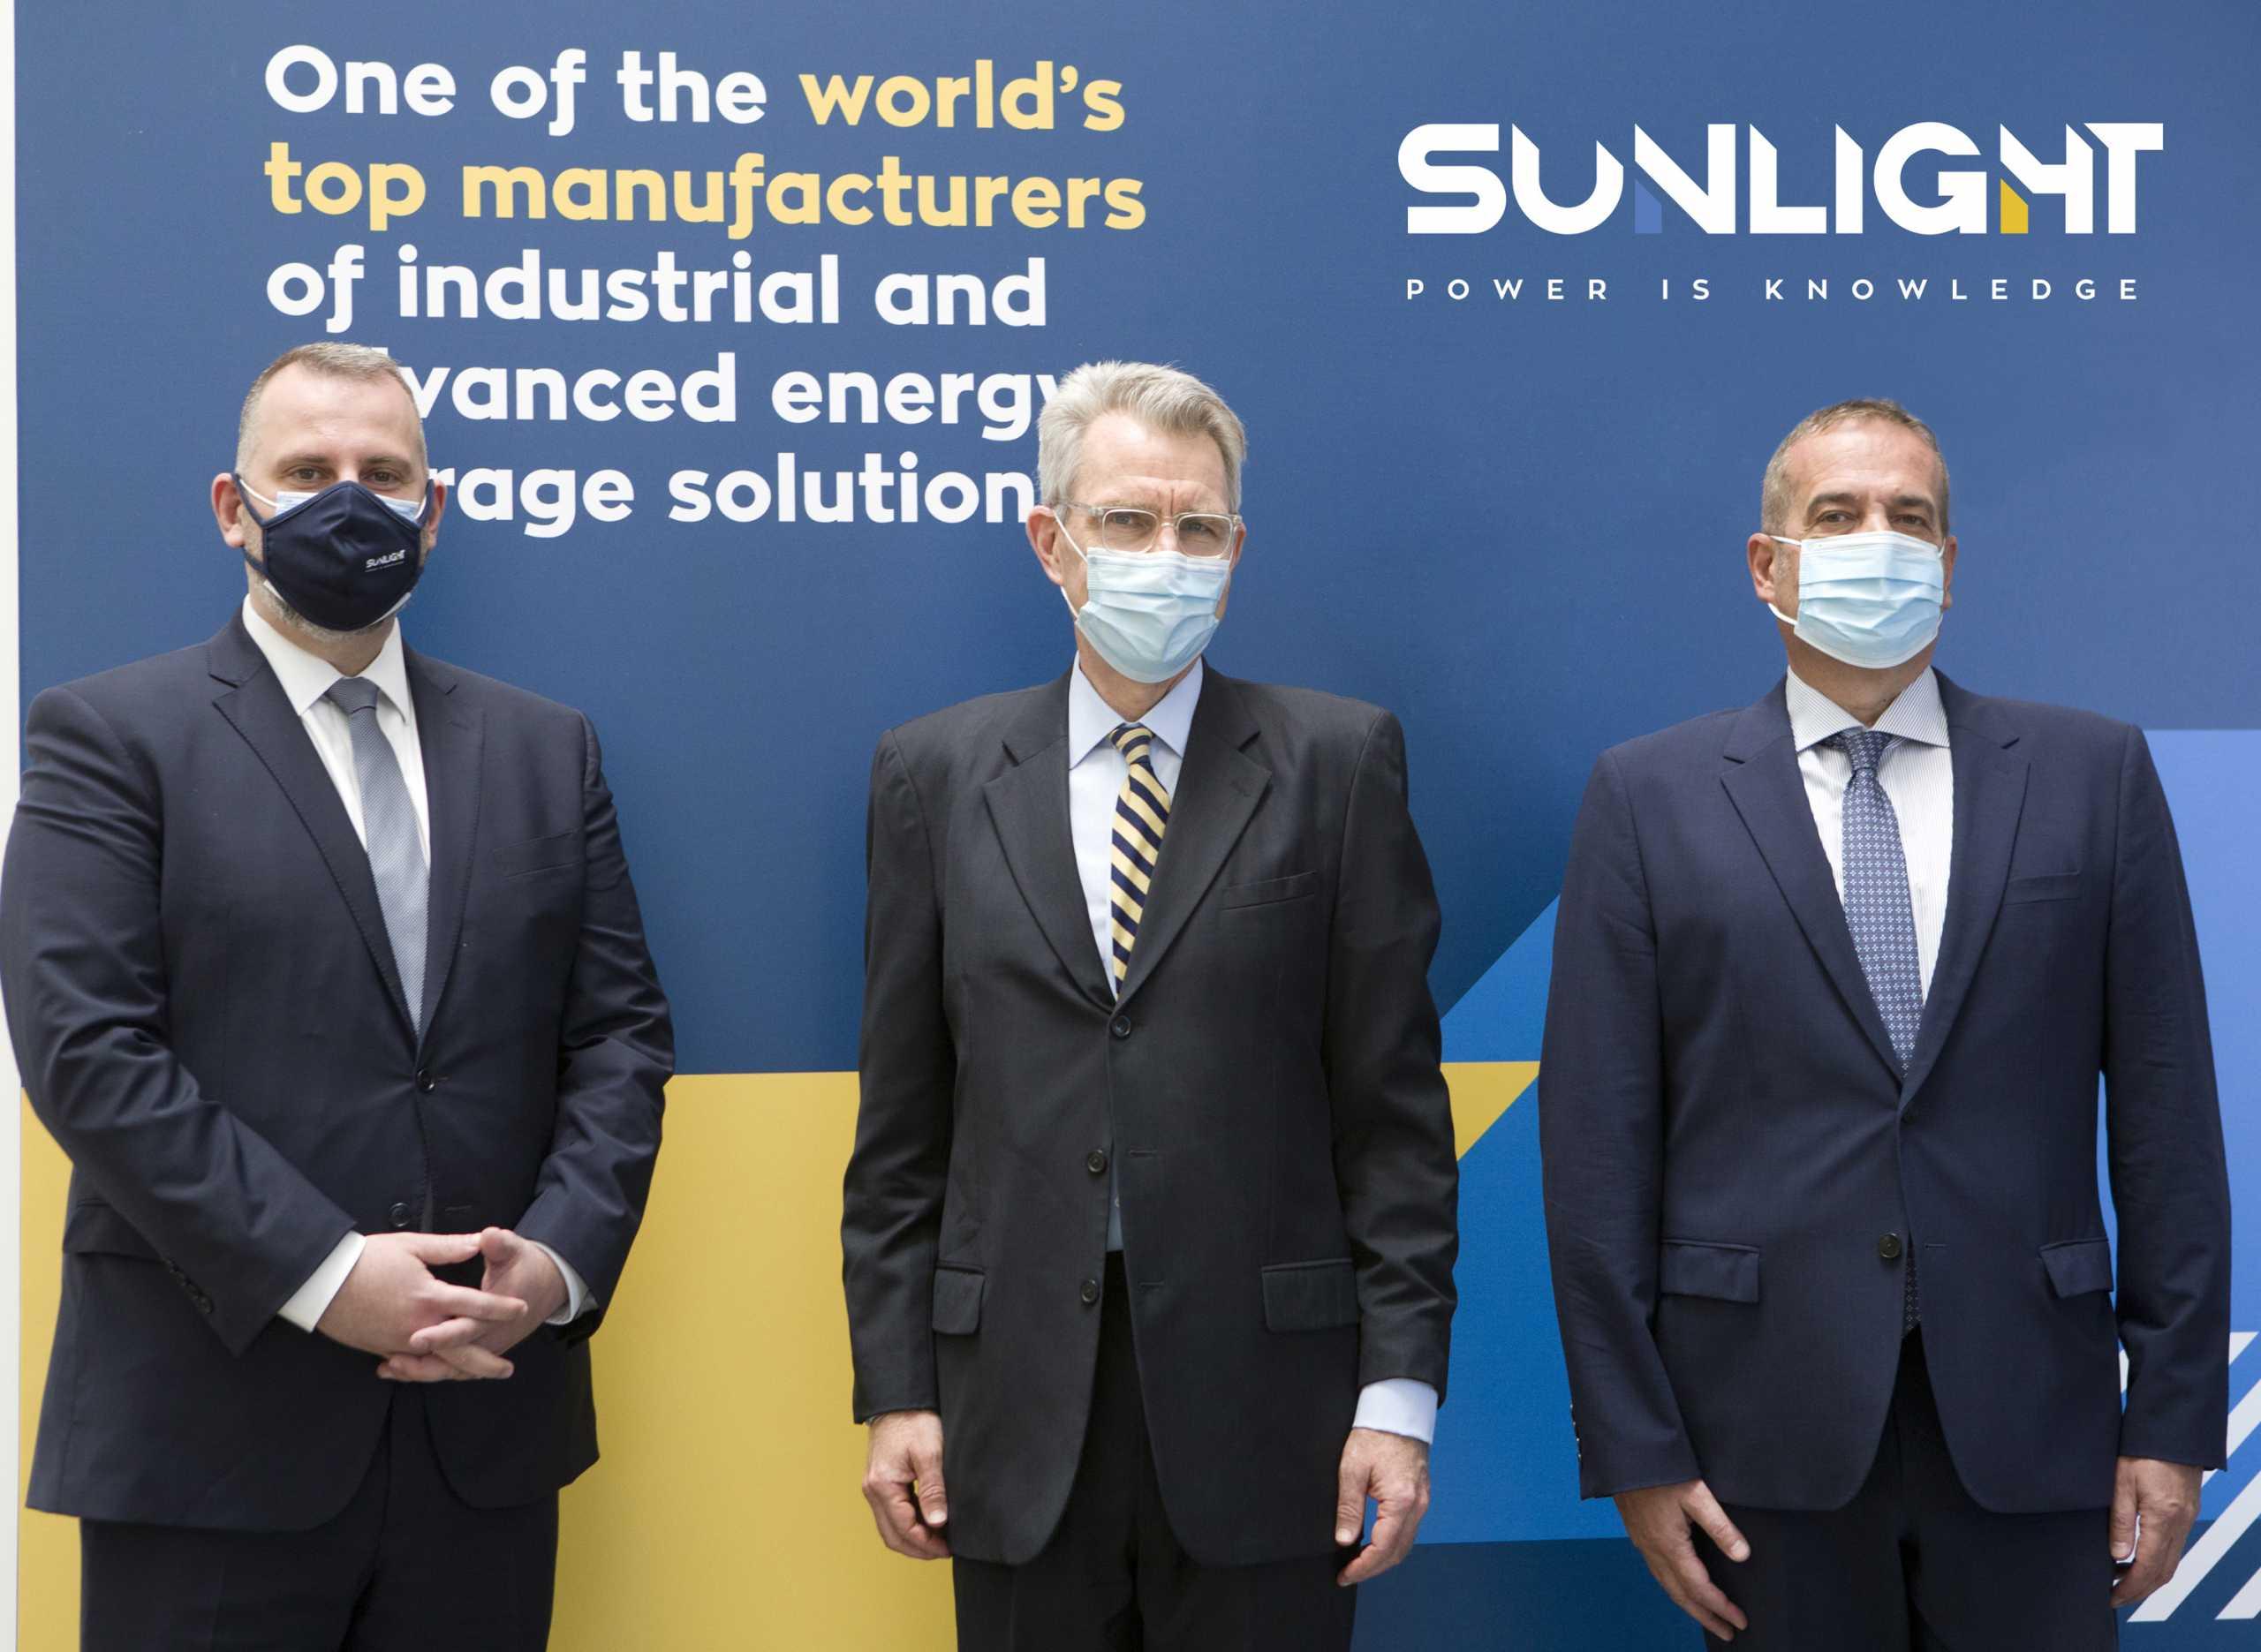 Sunlight: Για τα επενδυτικά σχέδια στην Αμερική συζήτησαν ο Πάιατ και η διοίκηση της εταιρείας